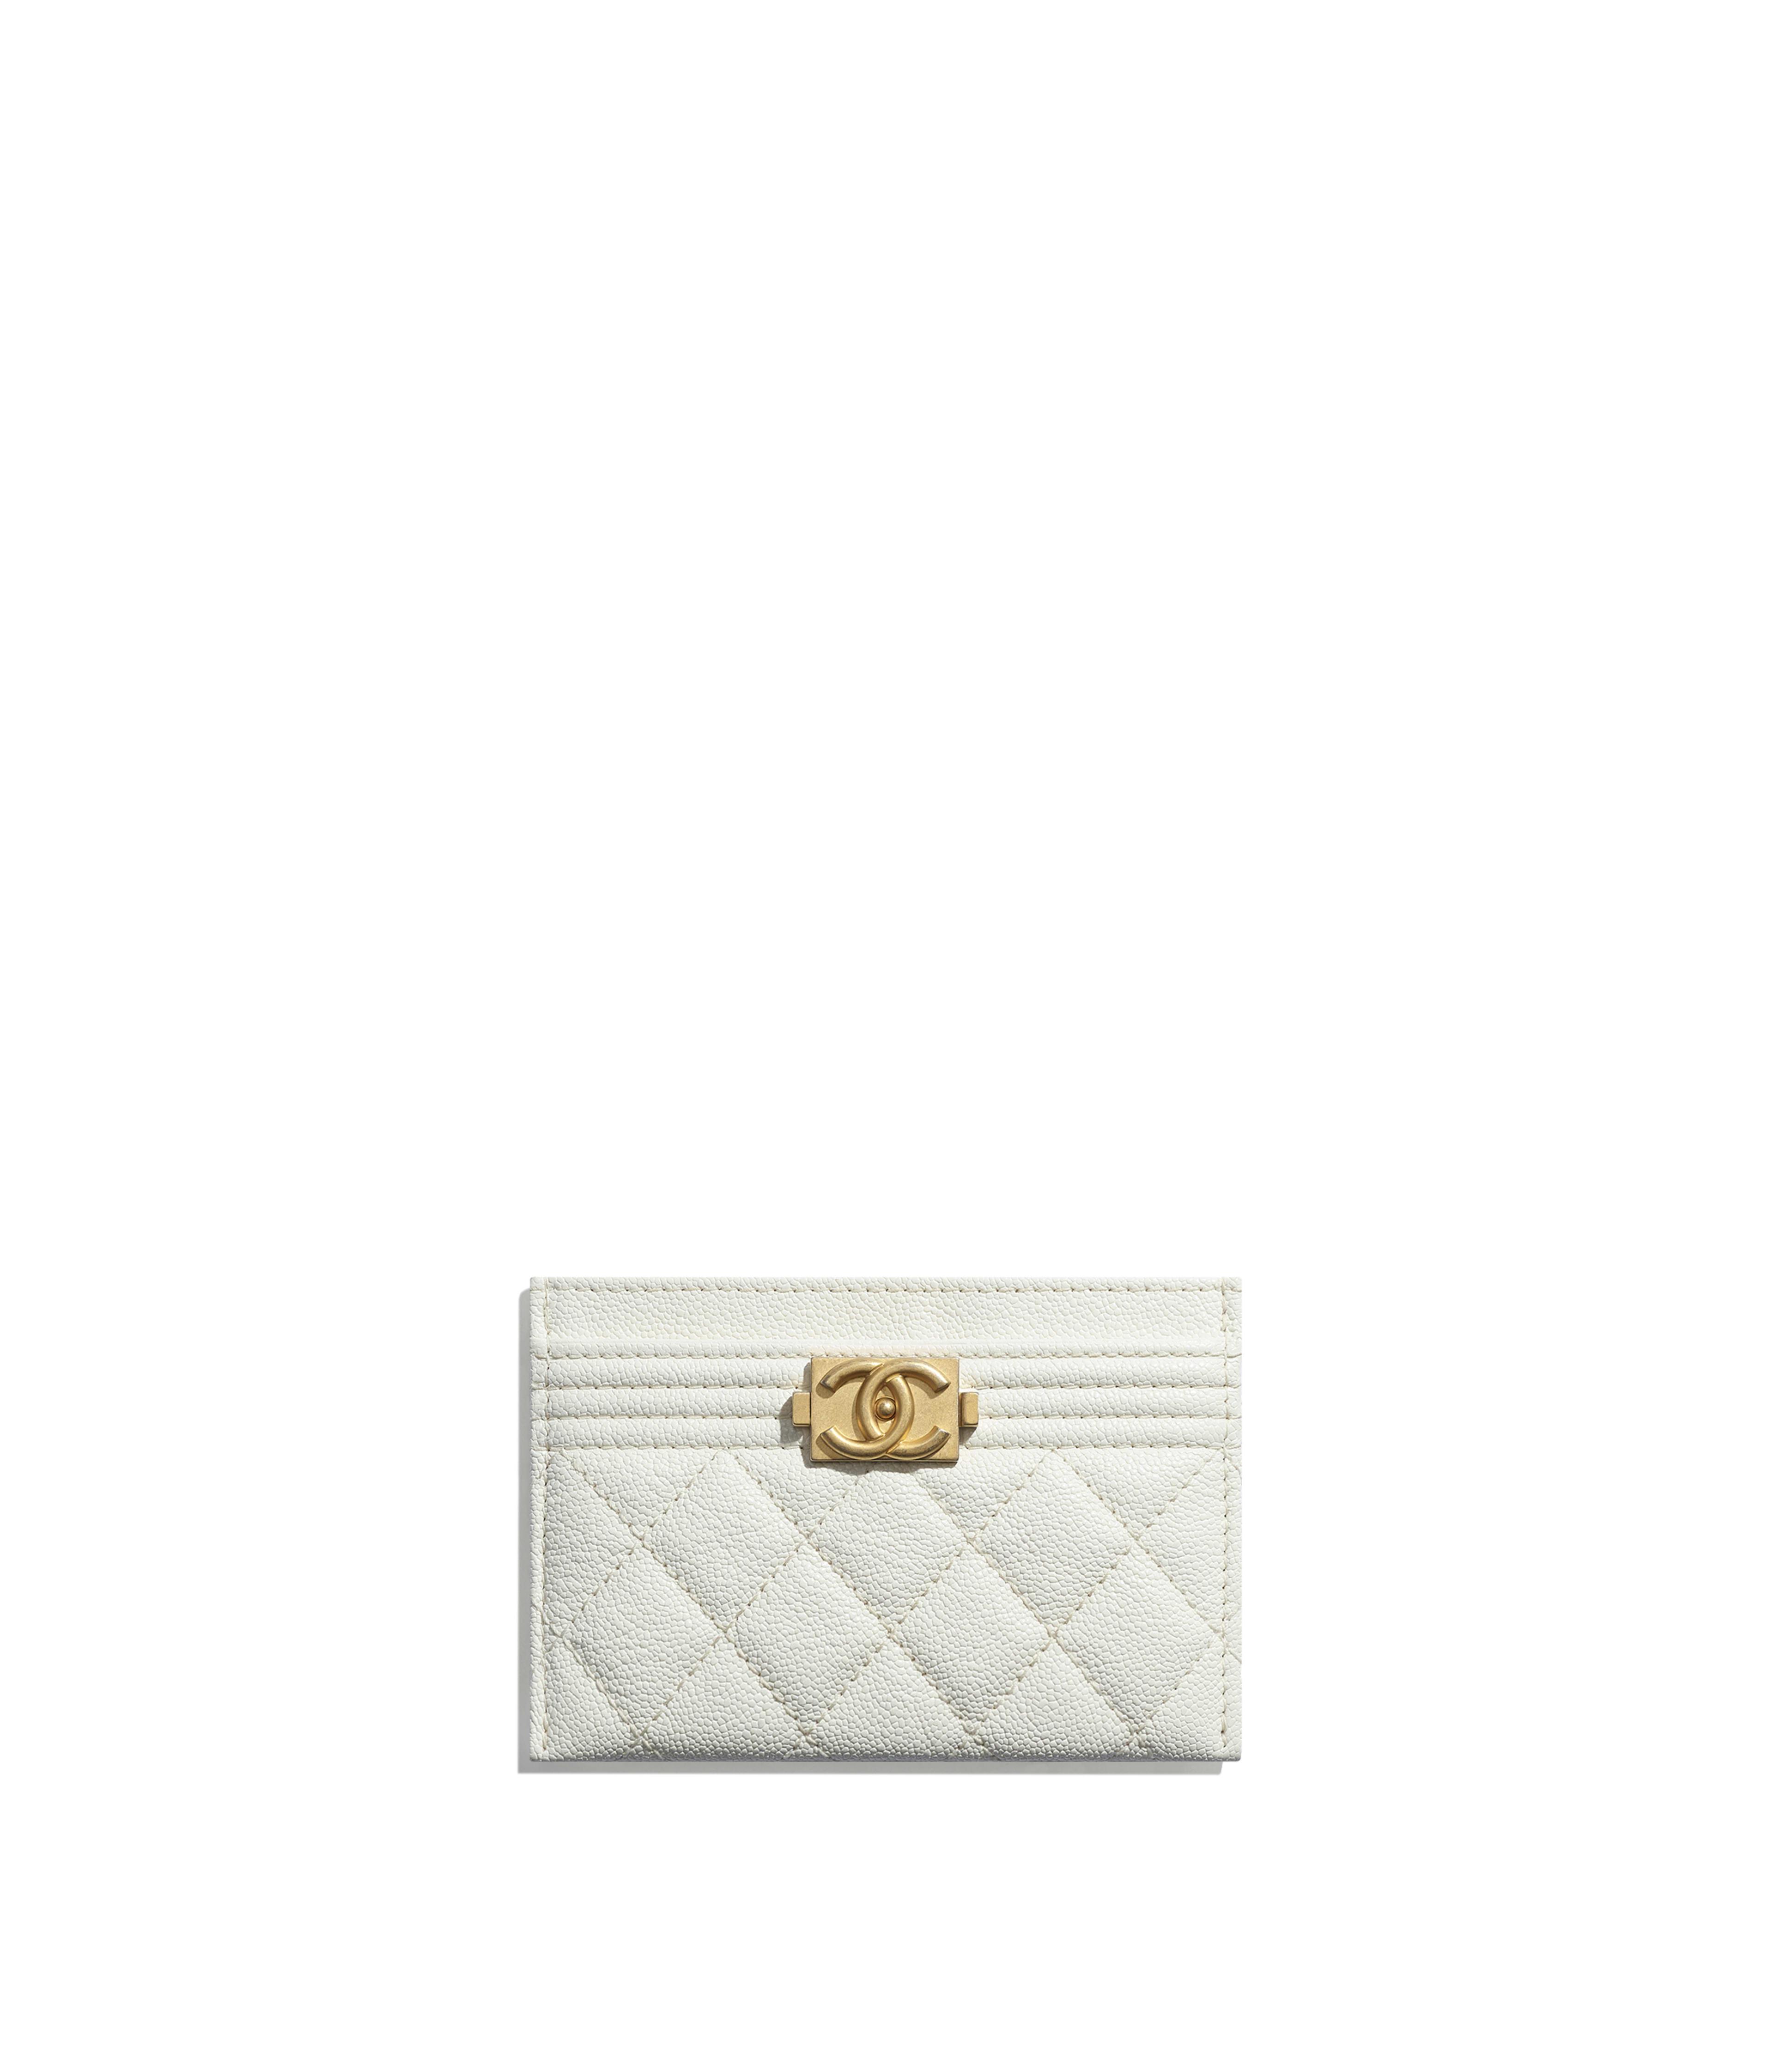 9029b8d22975 BOY CHANEL Card Holder Grained Calfskin & Gold-Tone Metal, White Ref.  A84431Y8362110601